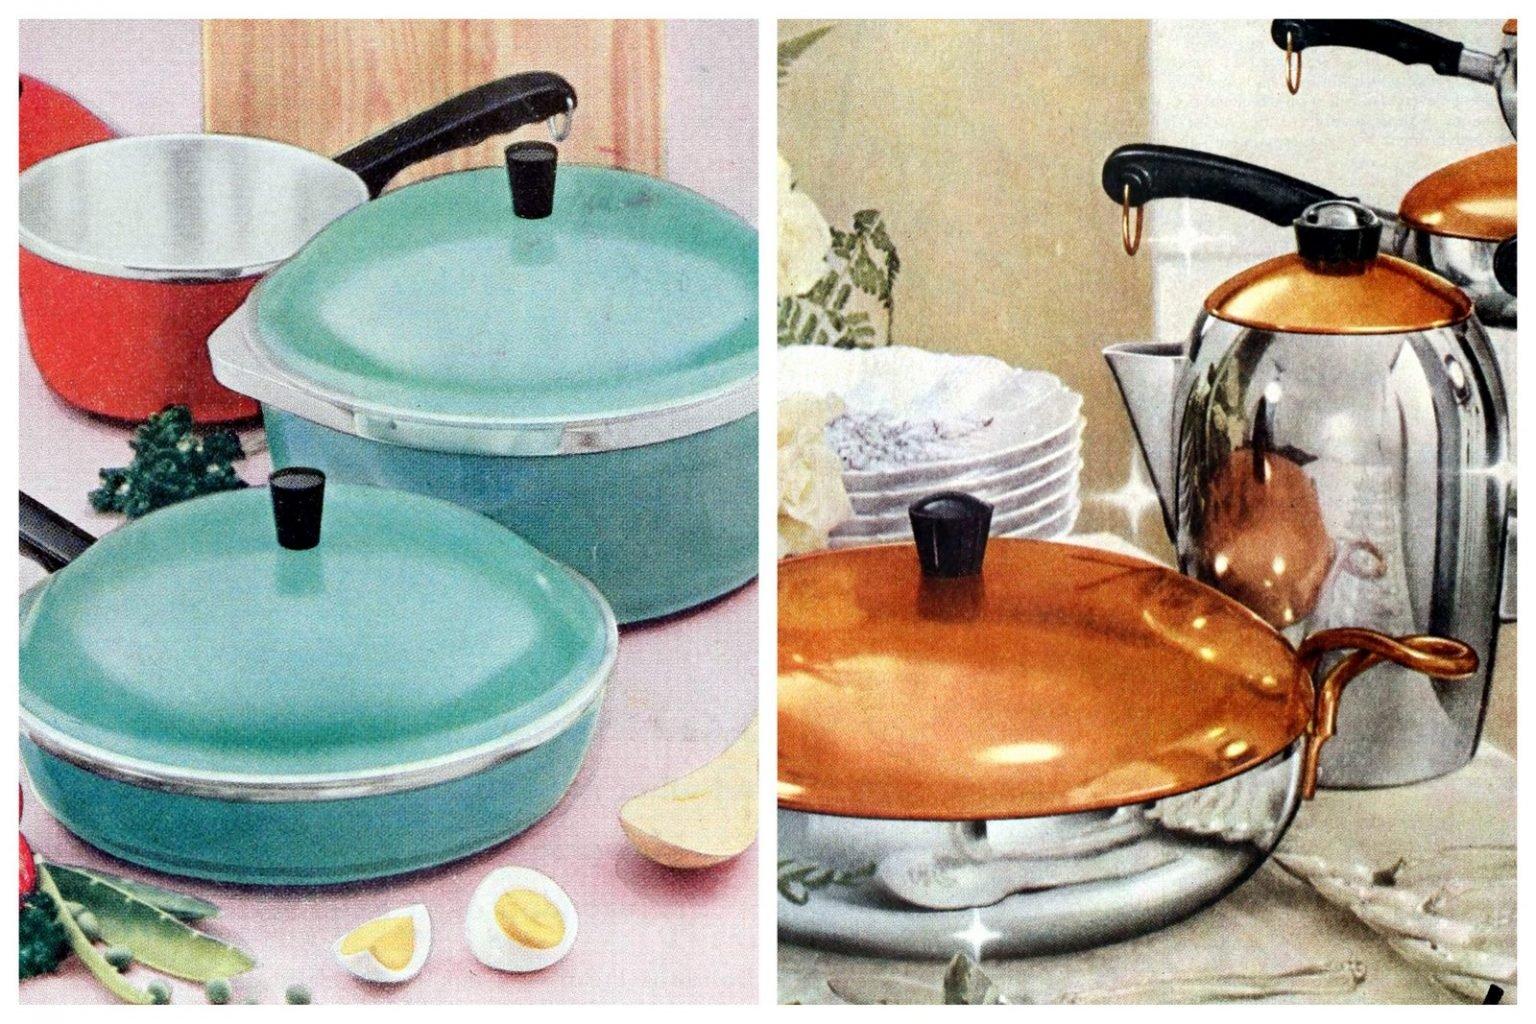 Vintage 1950s saucepans and kitchenware